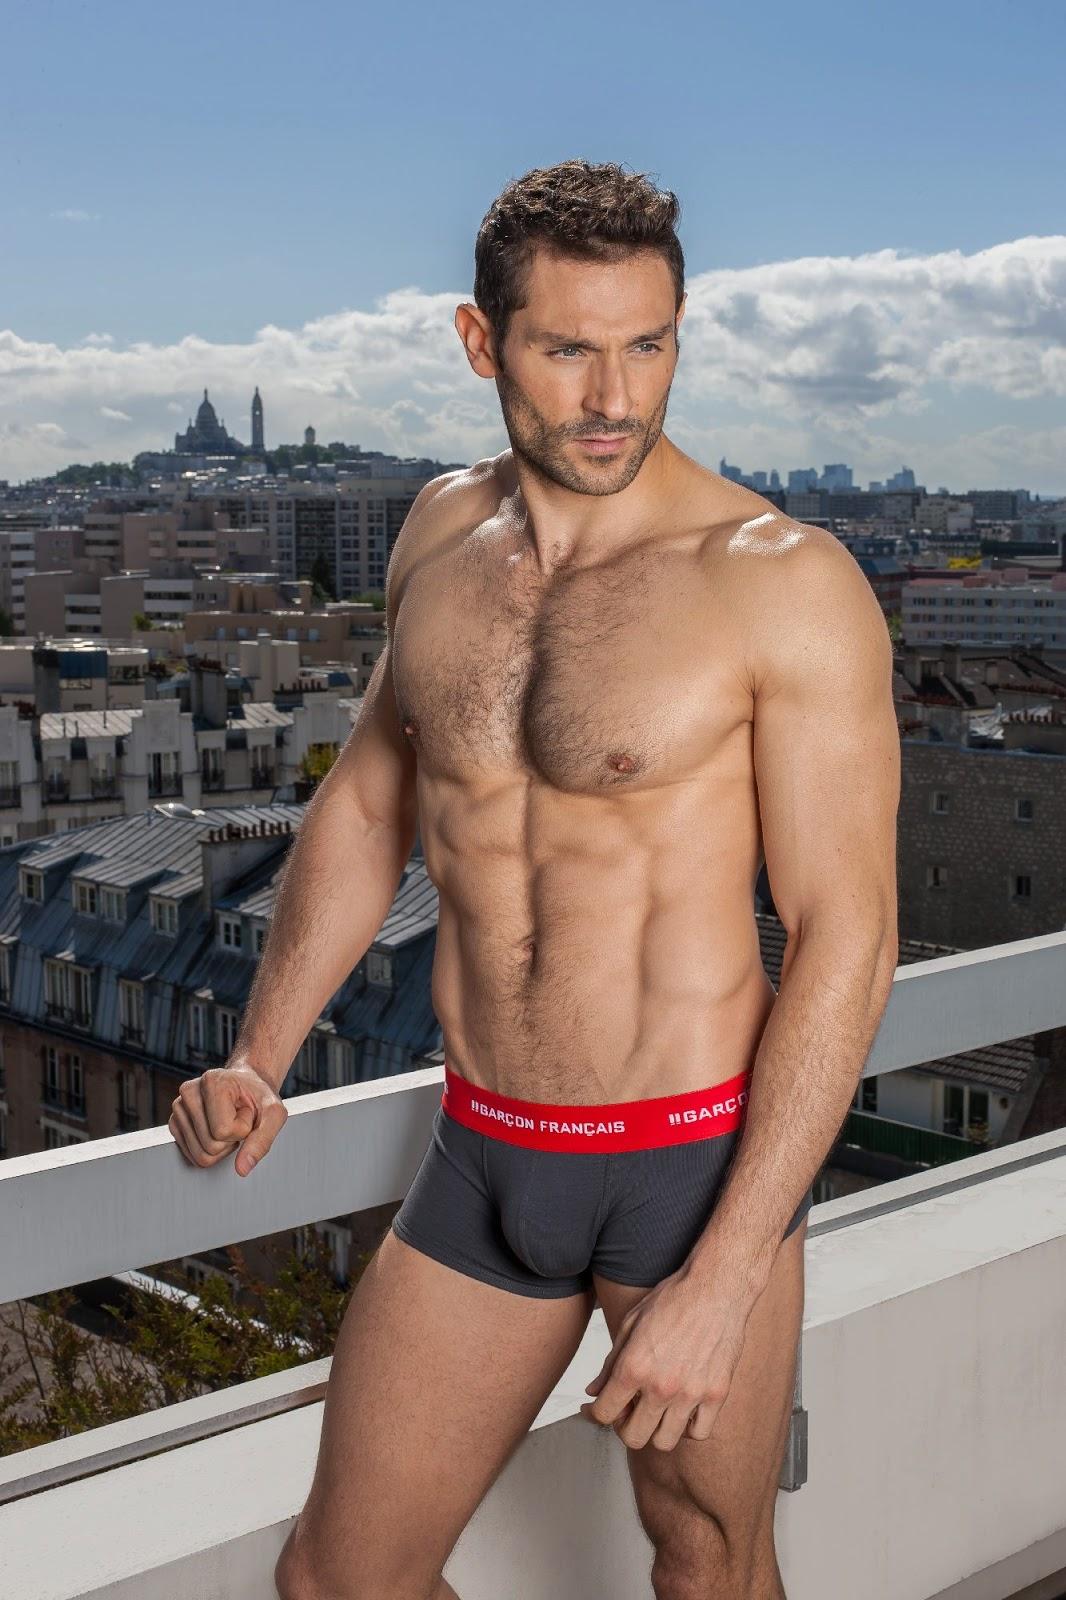 Garcon Francais underwear - charcoal grey trunks